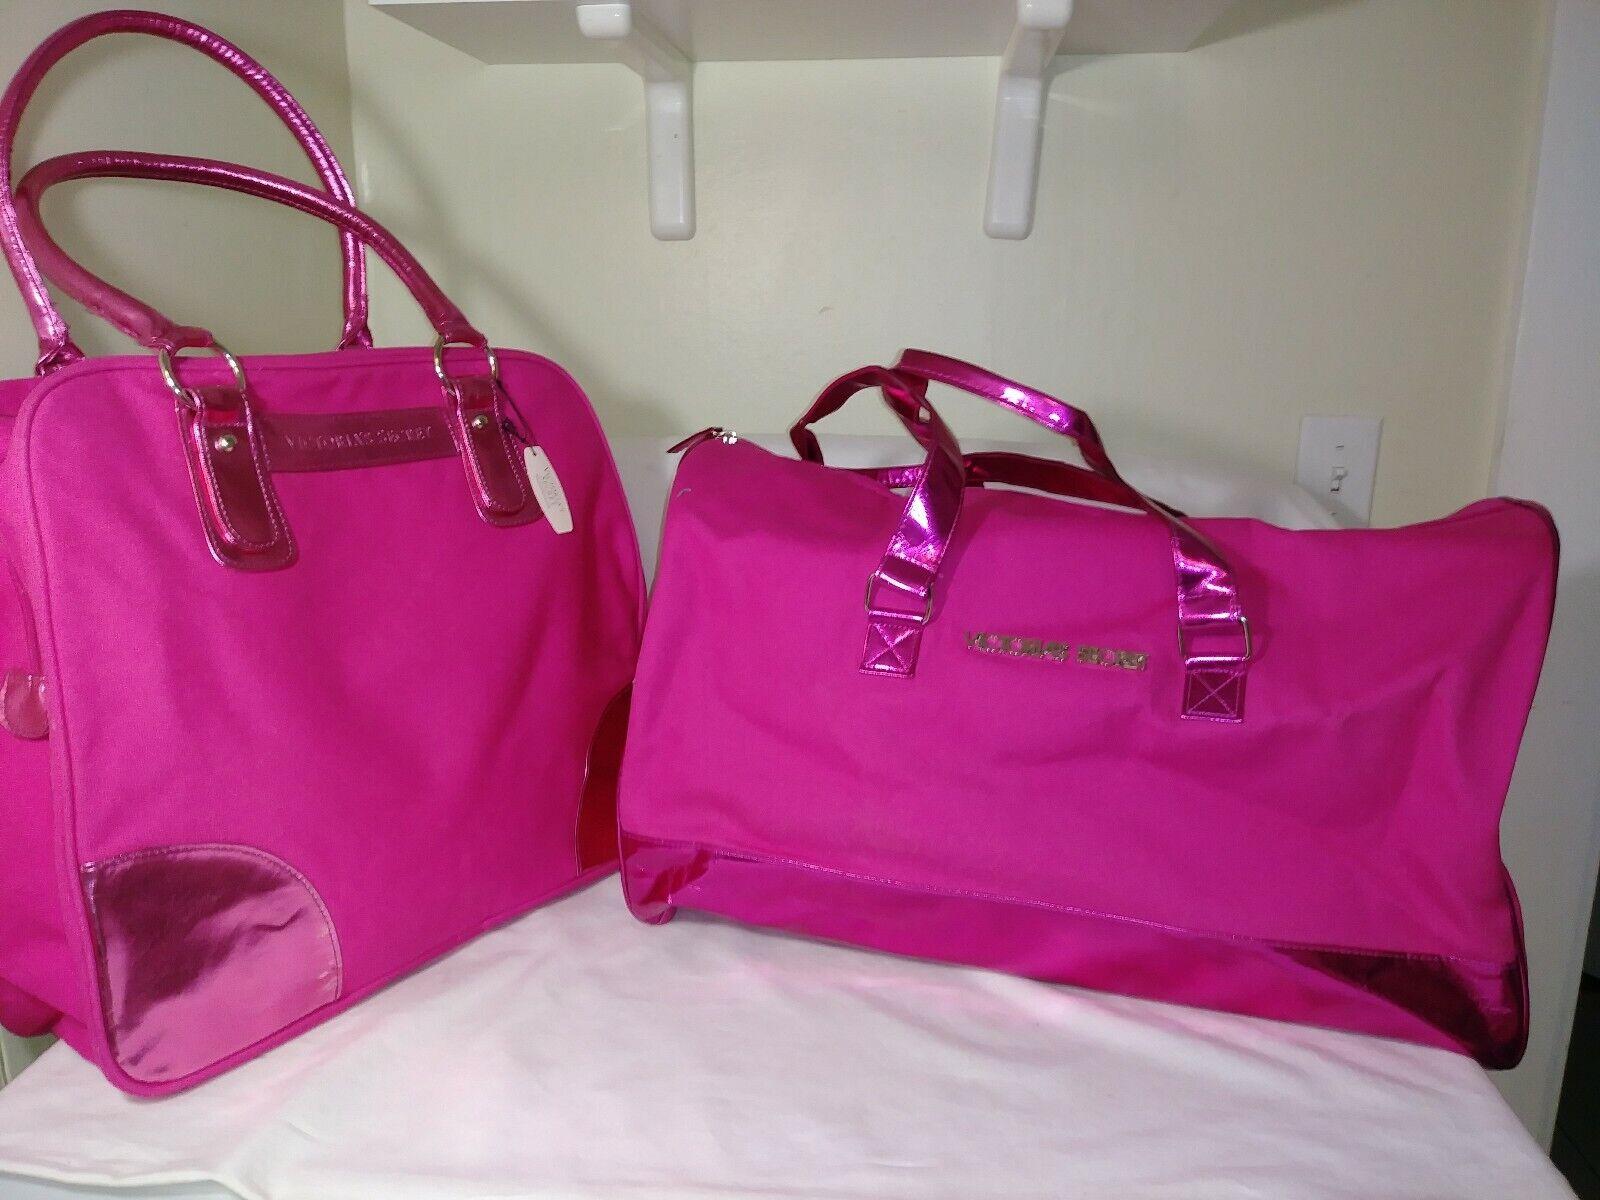 NWT Victorias Secret Large Duffle Bag & Tote, 2pc Luggage Se